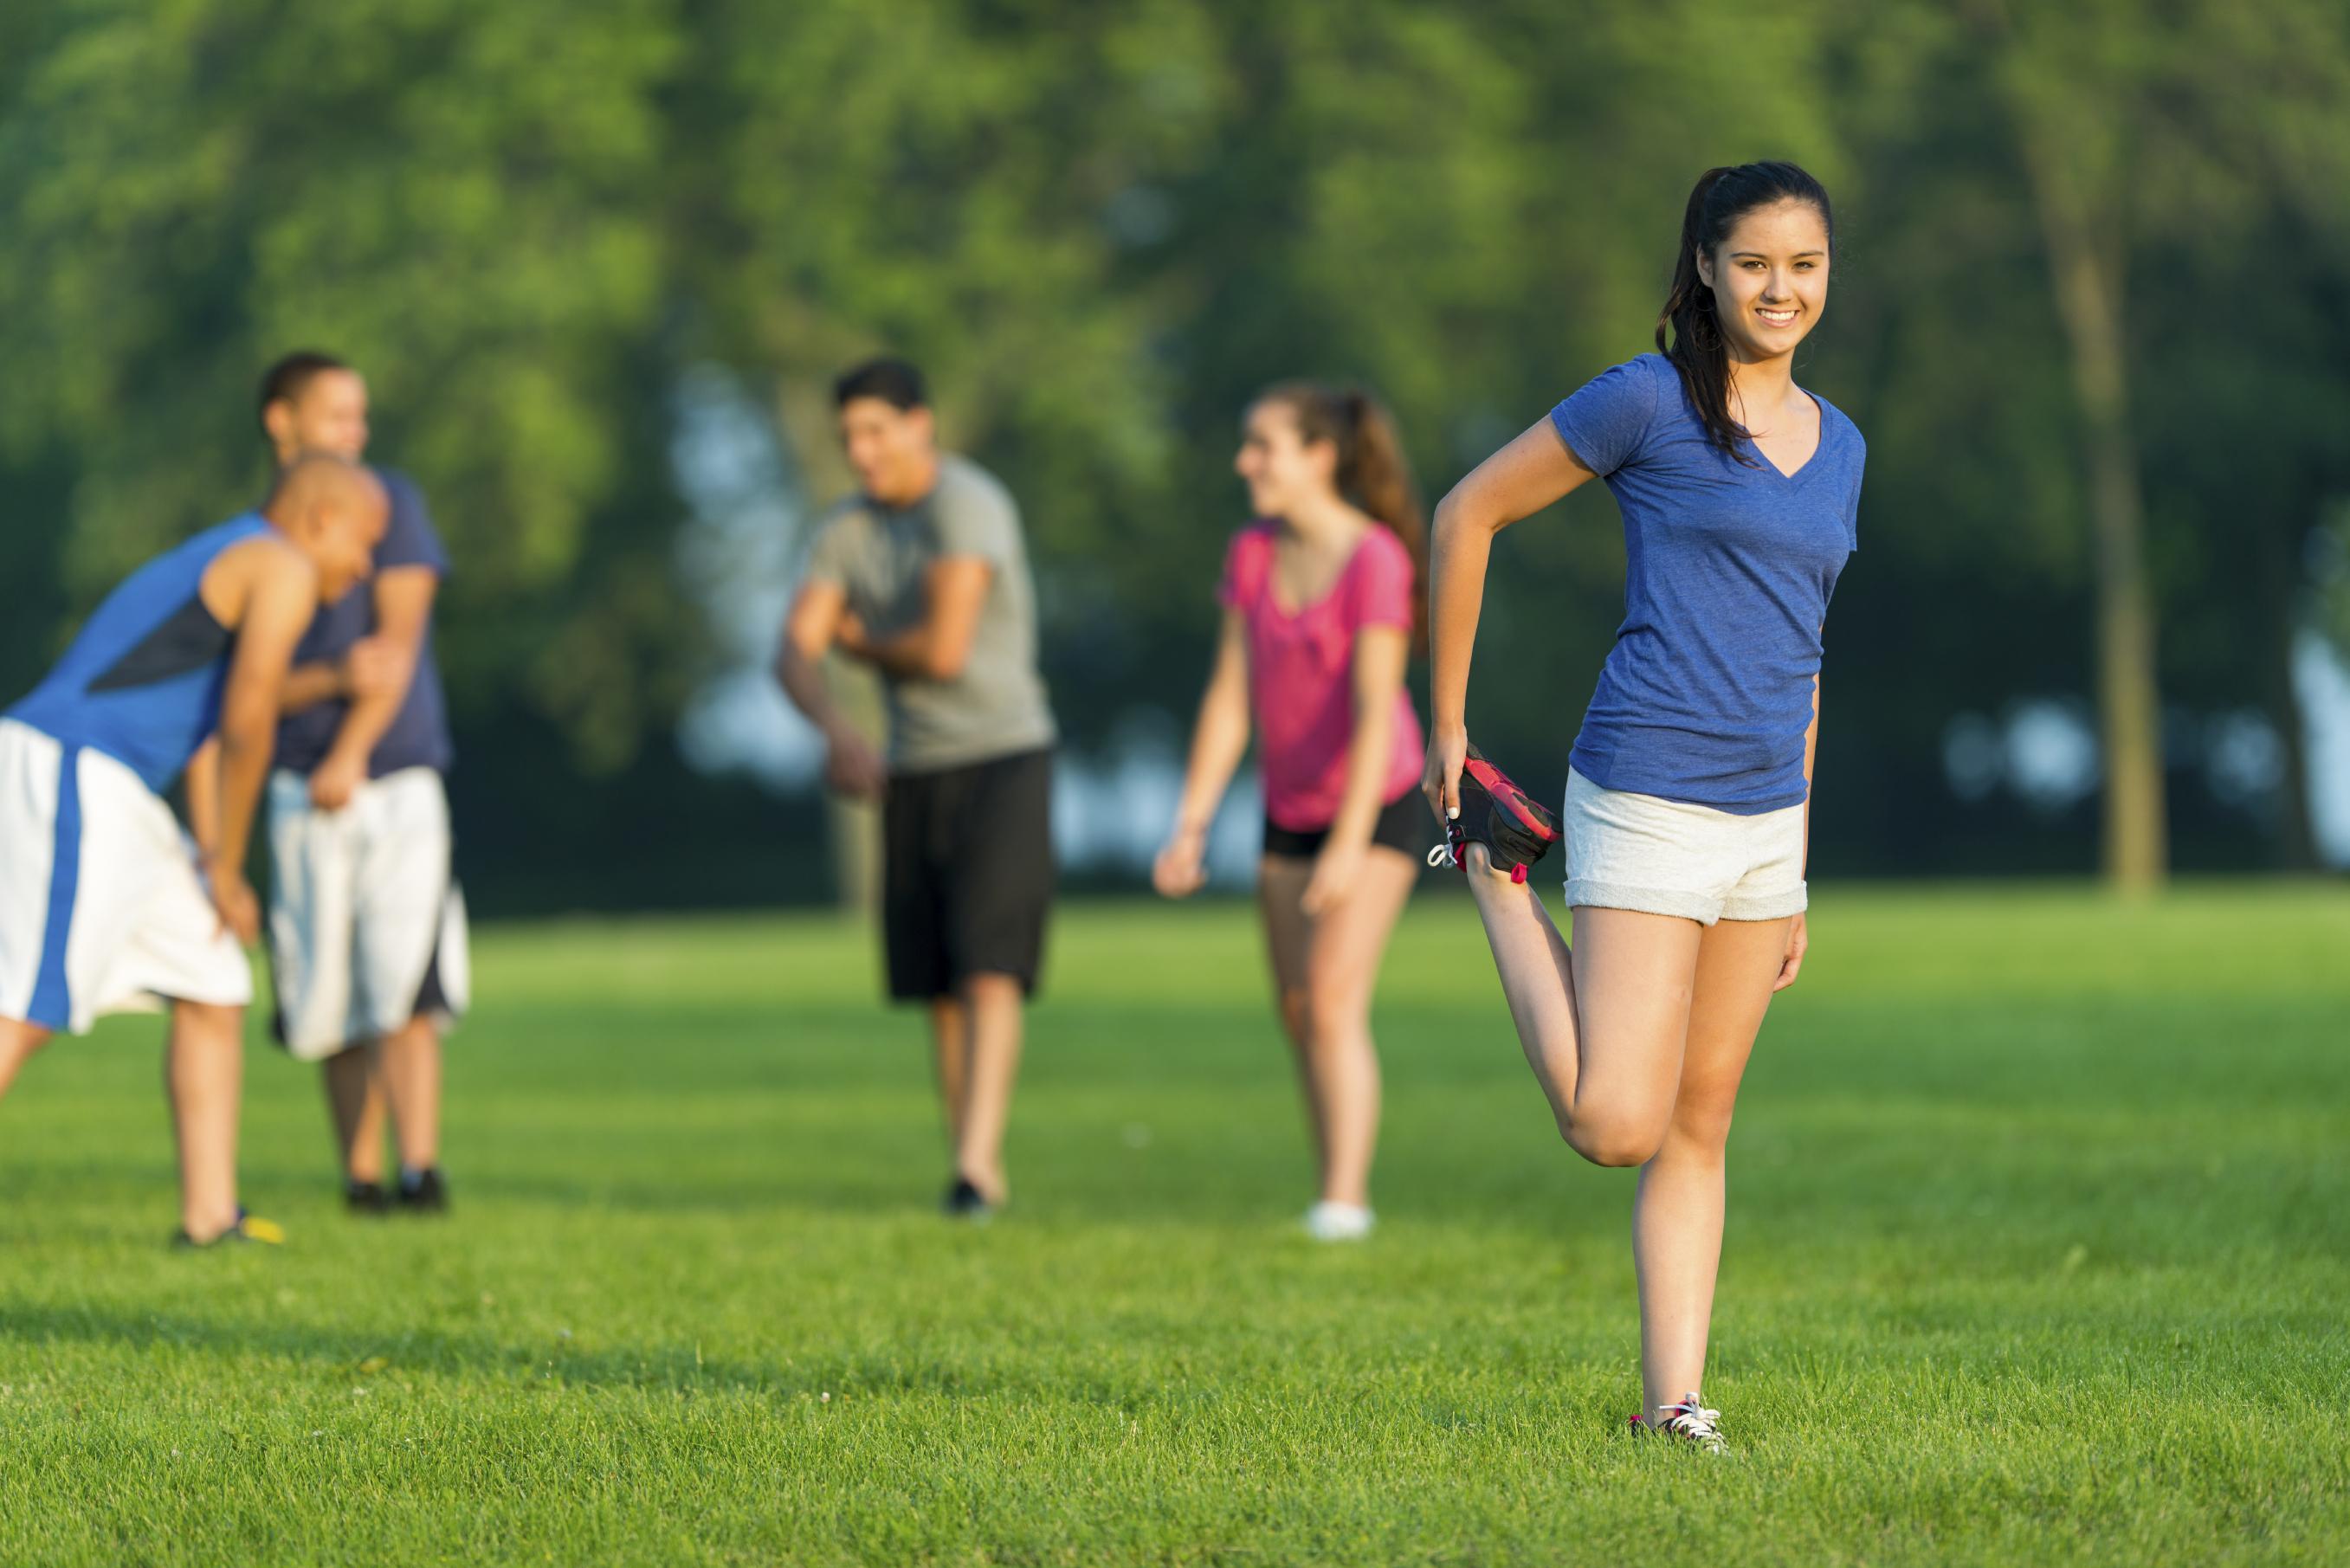 Teens exercising